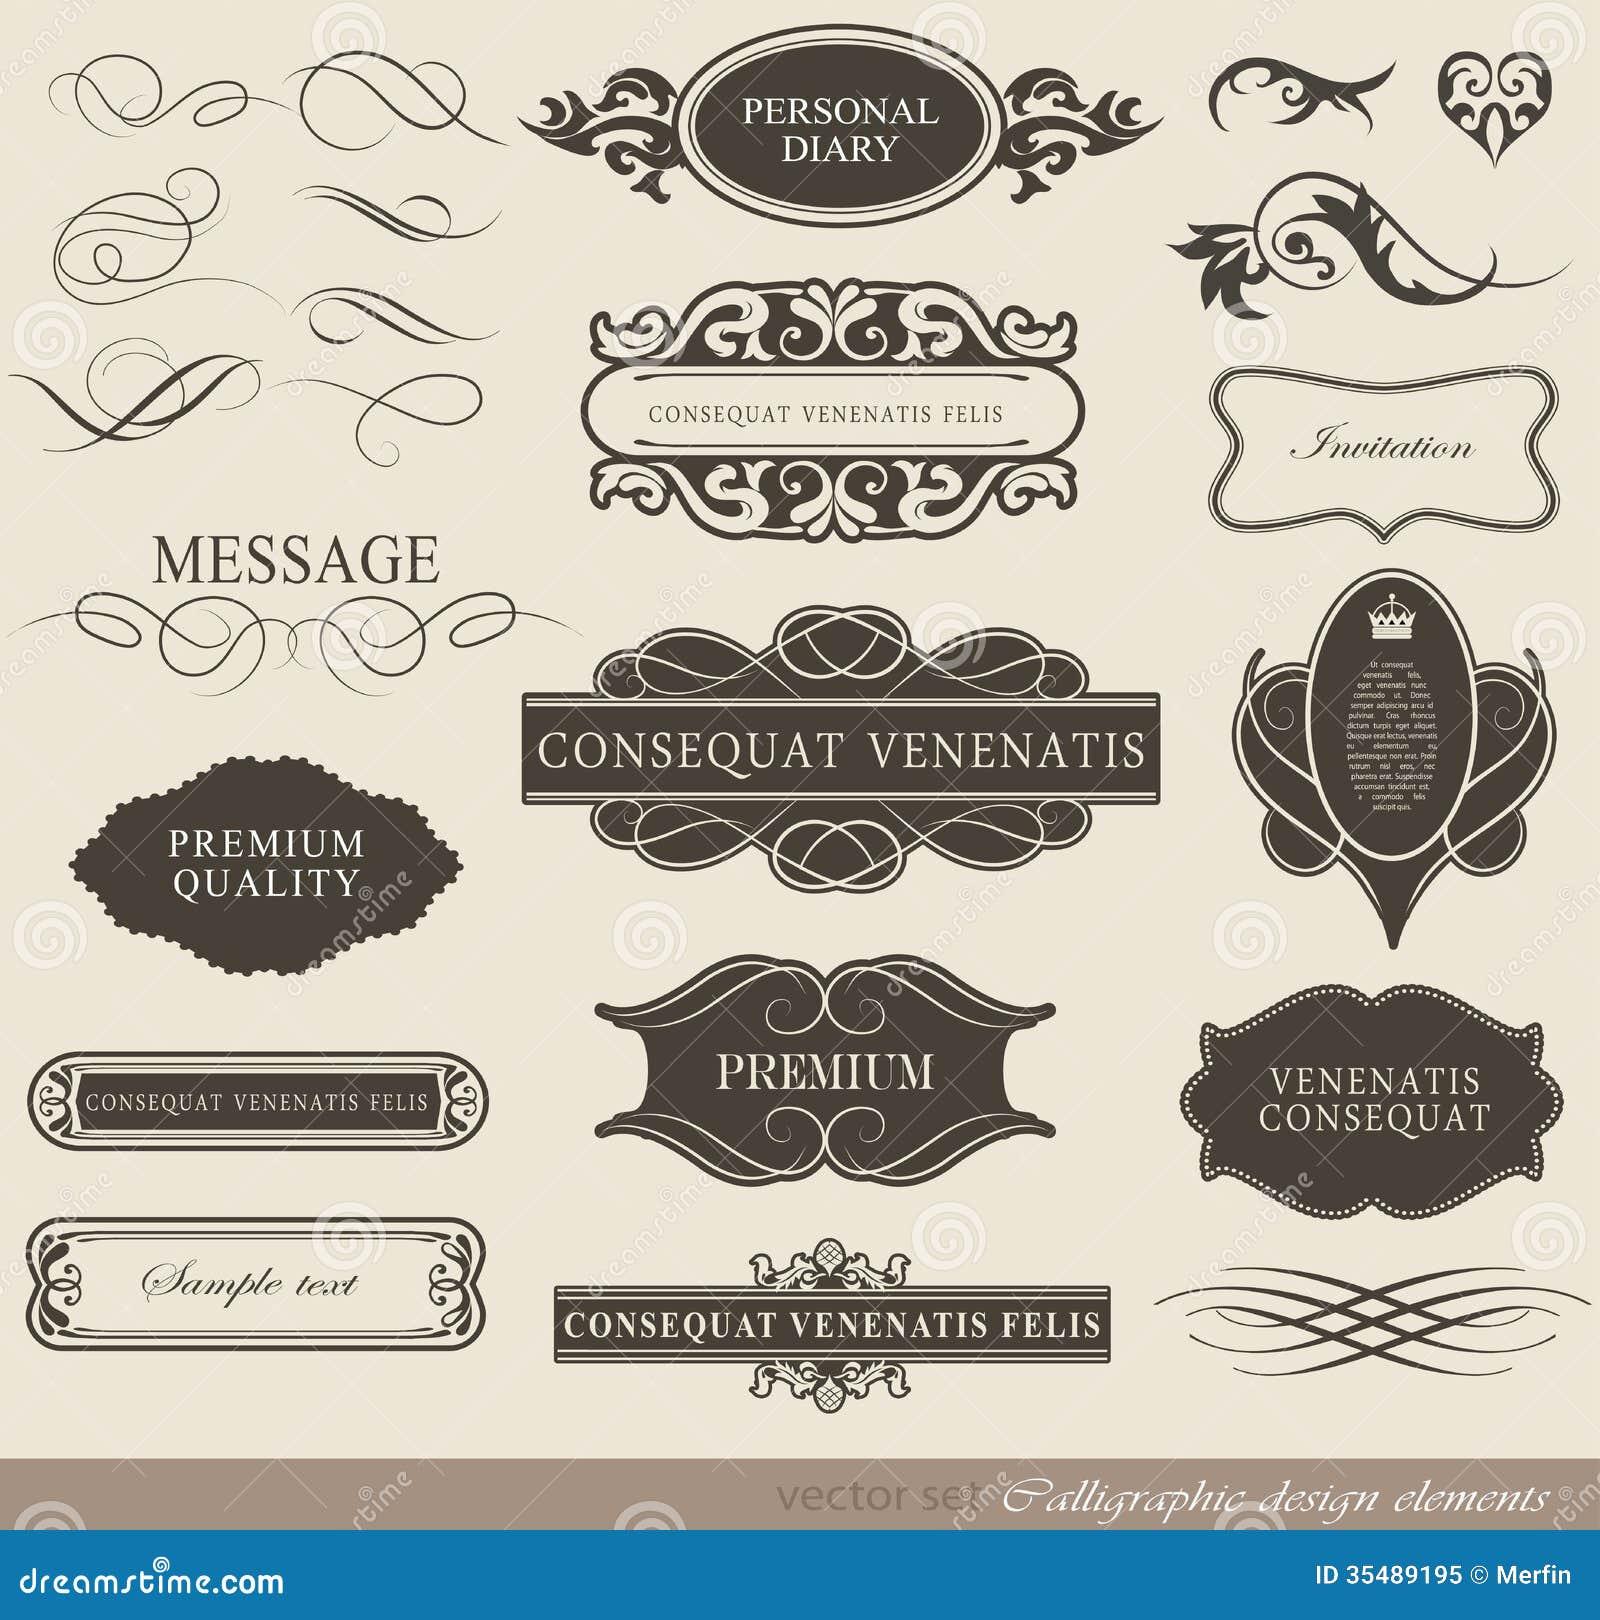 Calligraphic design elements stock vector illustration of download calligraphic design elements stock vector illustration of invitation decorative 35489195 stopboris Choice Image